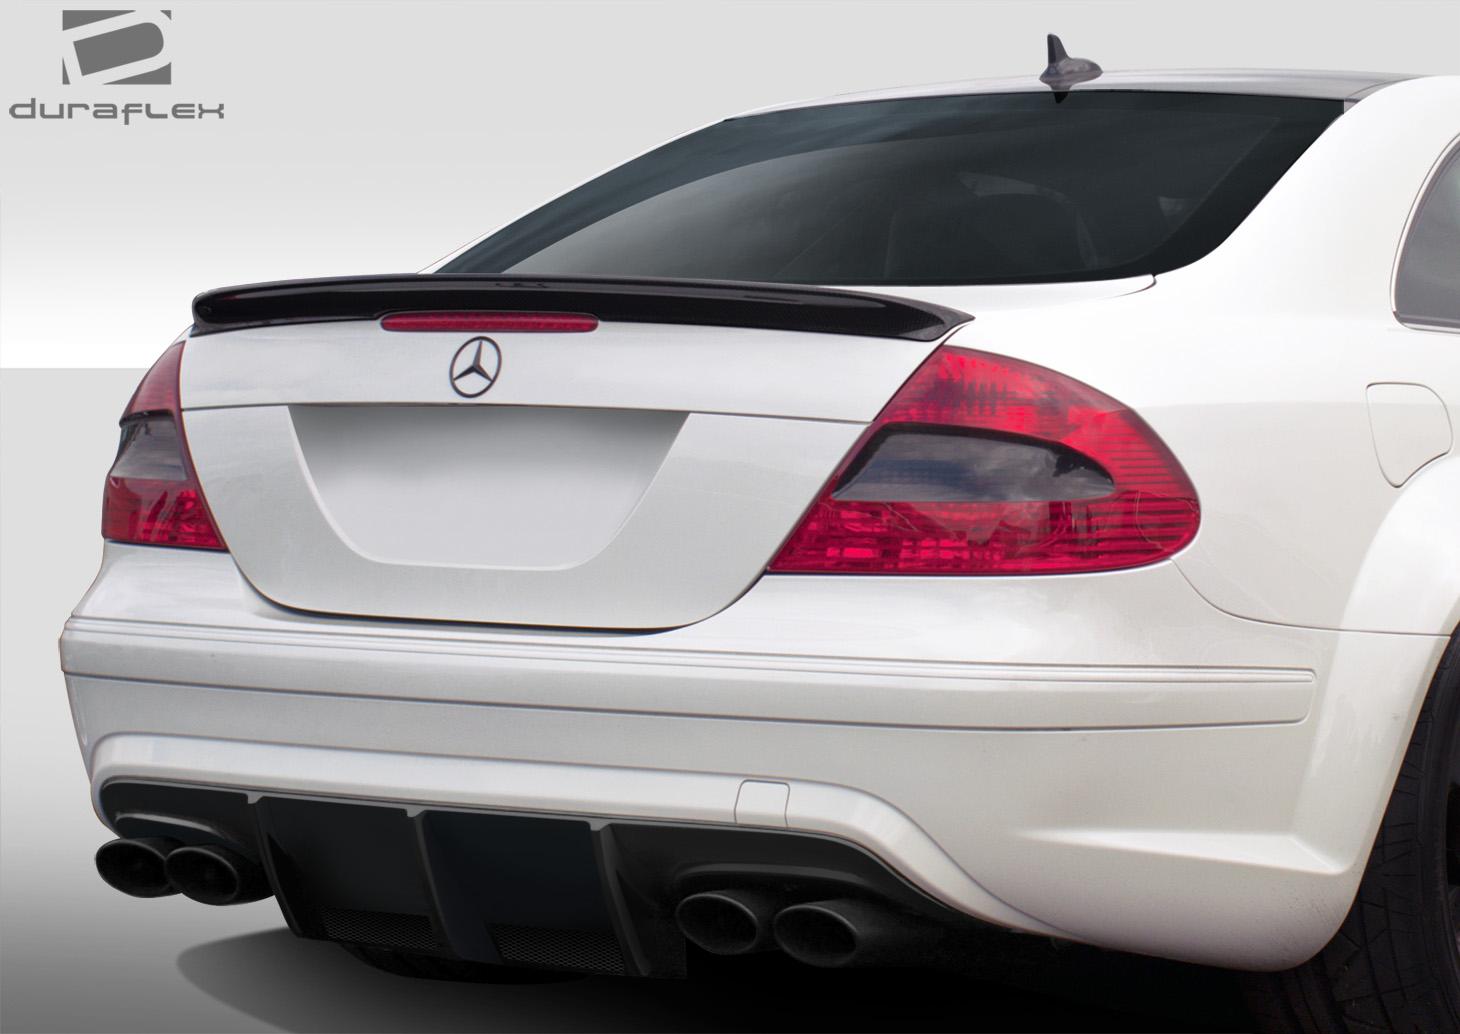 03 09 mercedes clk black series duraflex rear wide body for Mercedes benz clk black series body kit